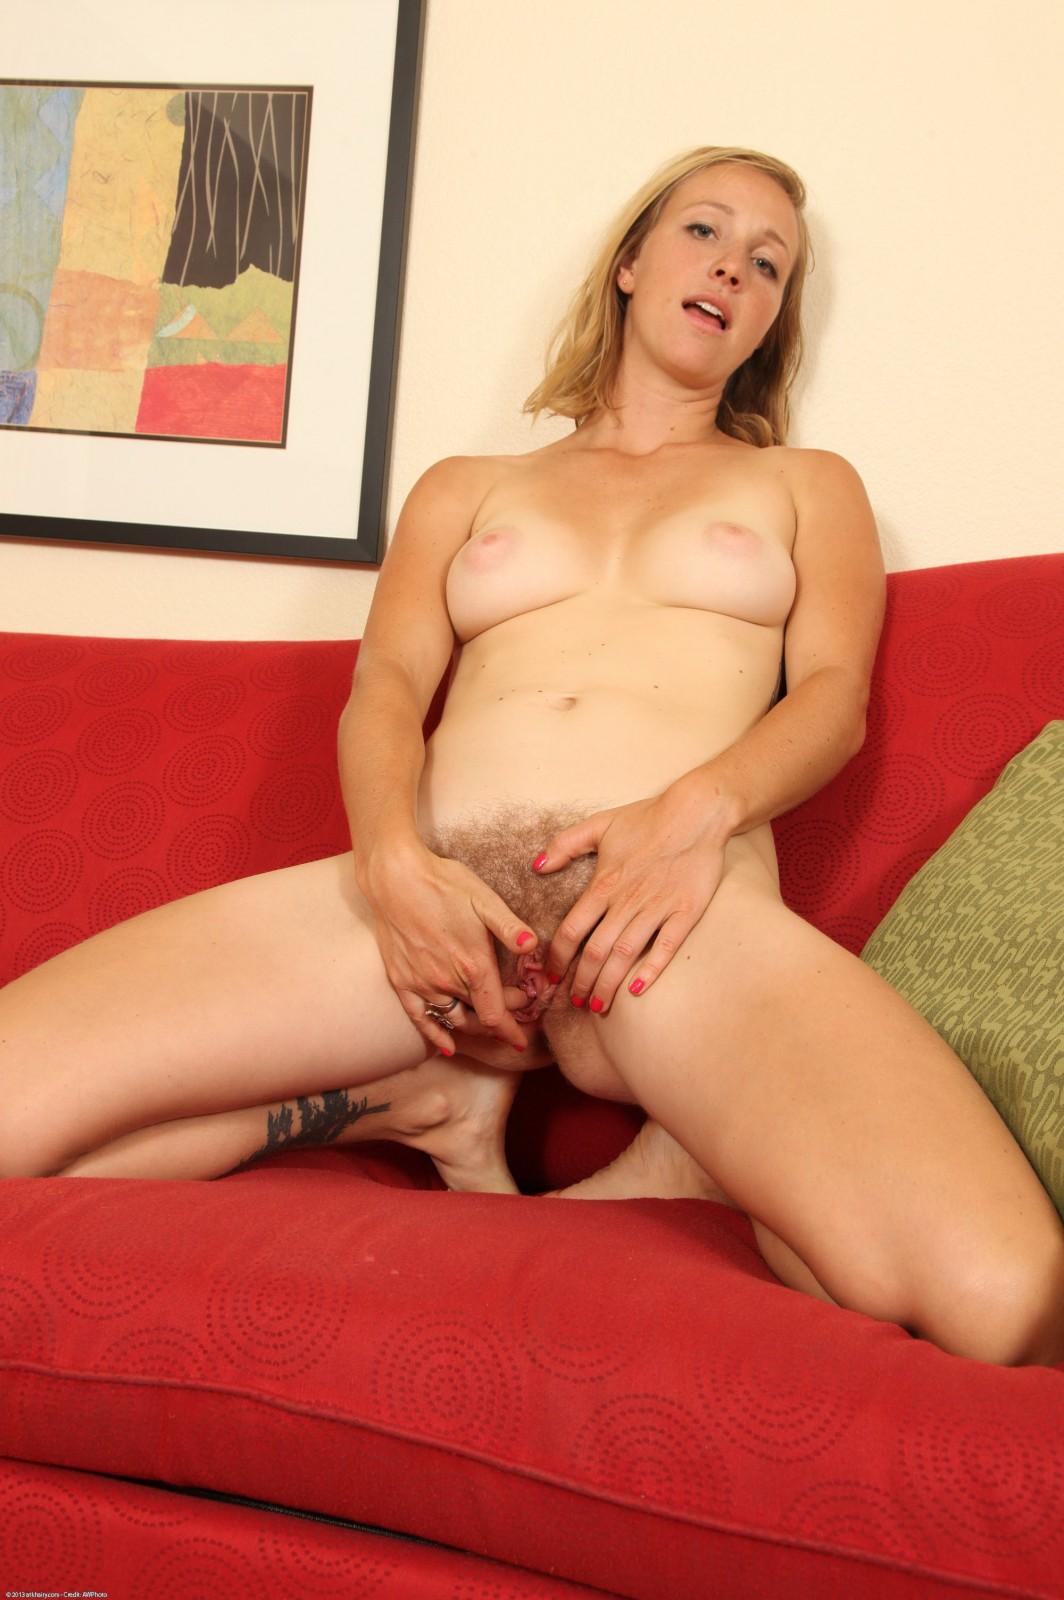 Women masturbating their pussy